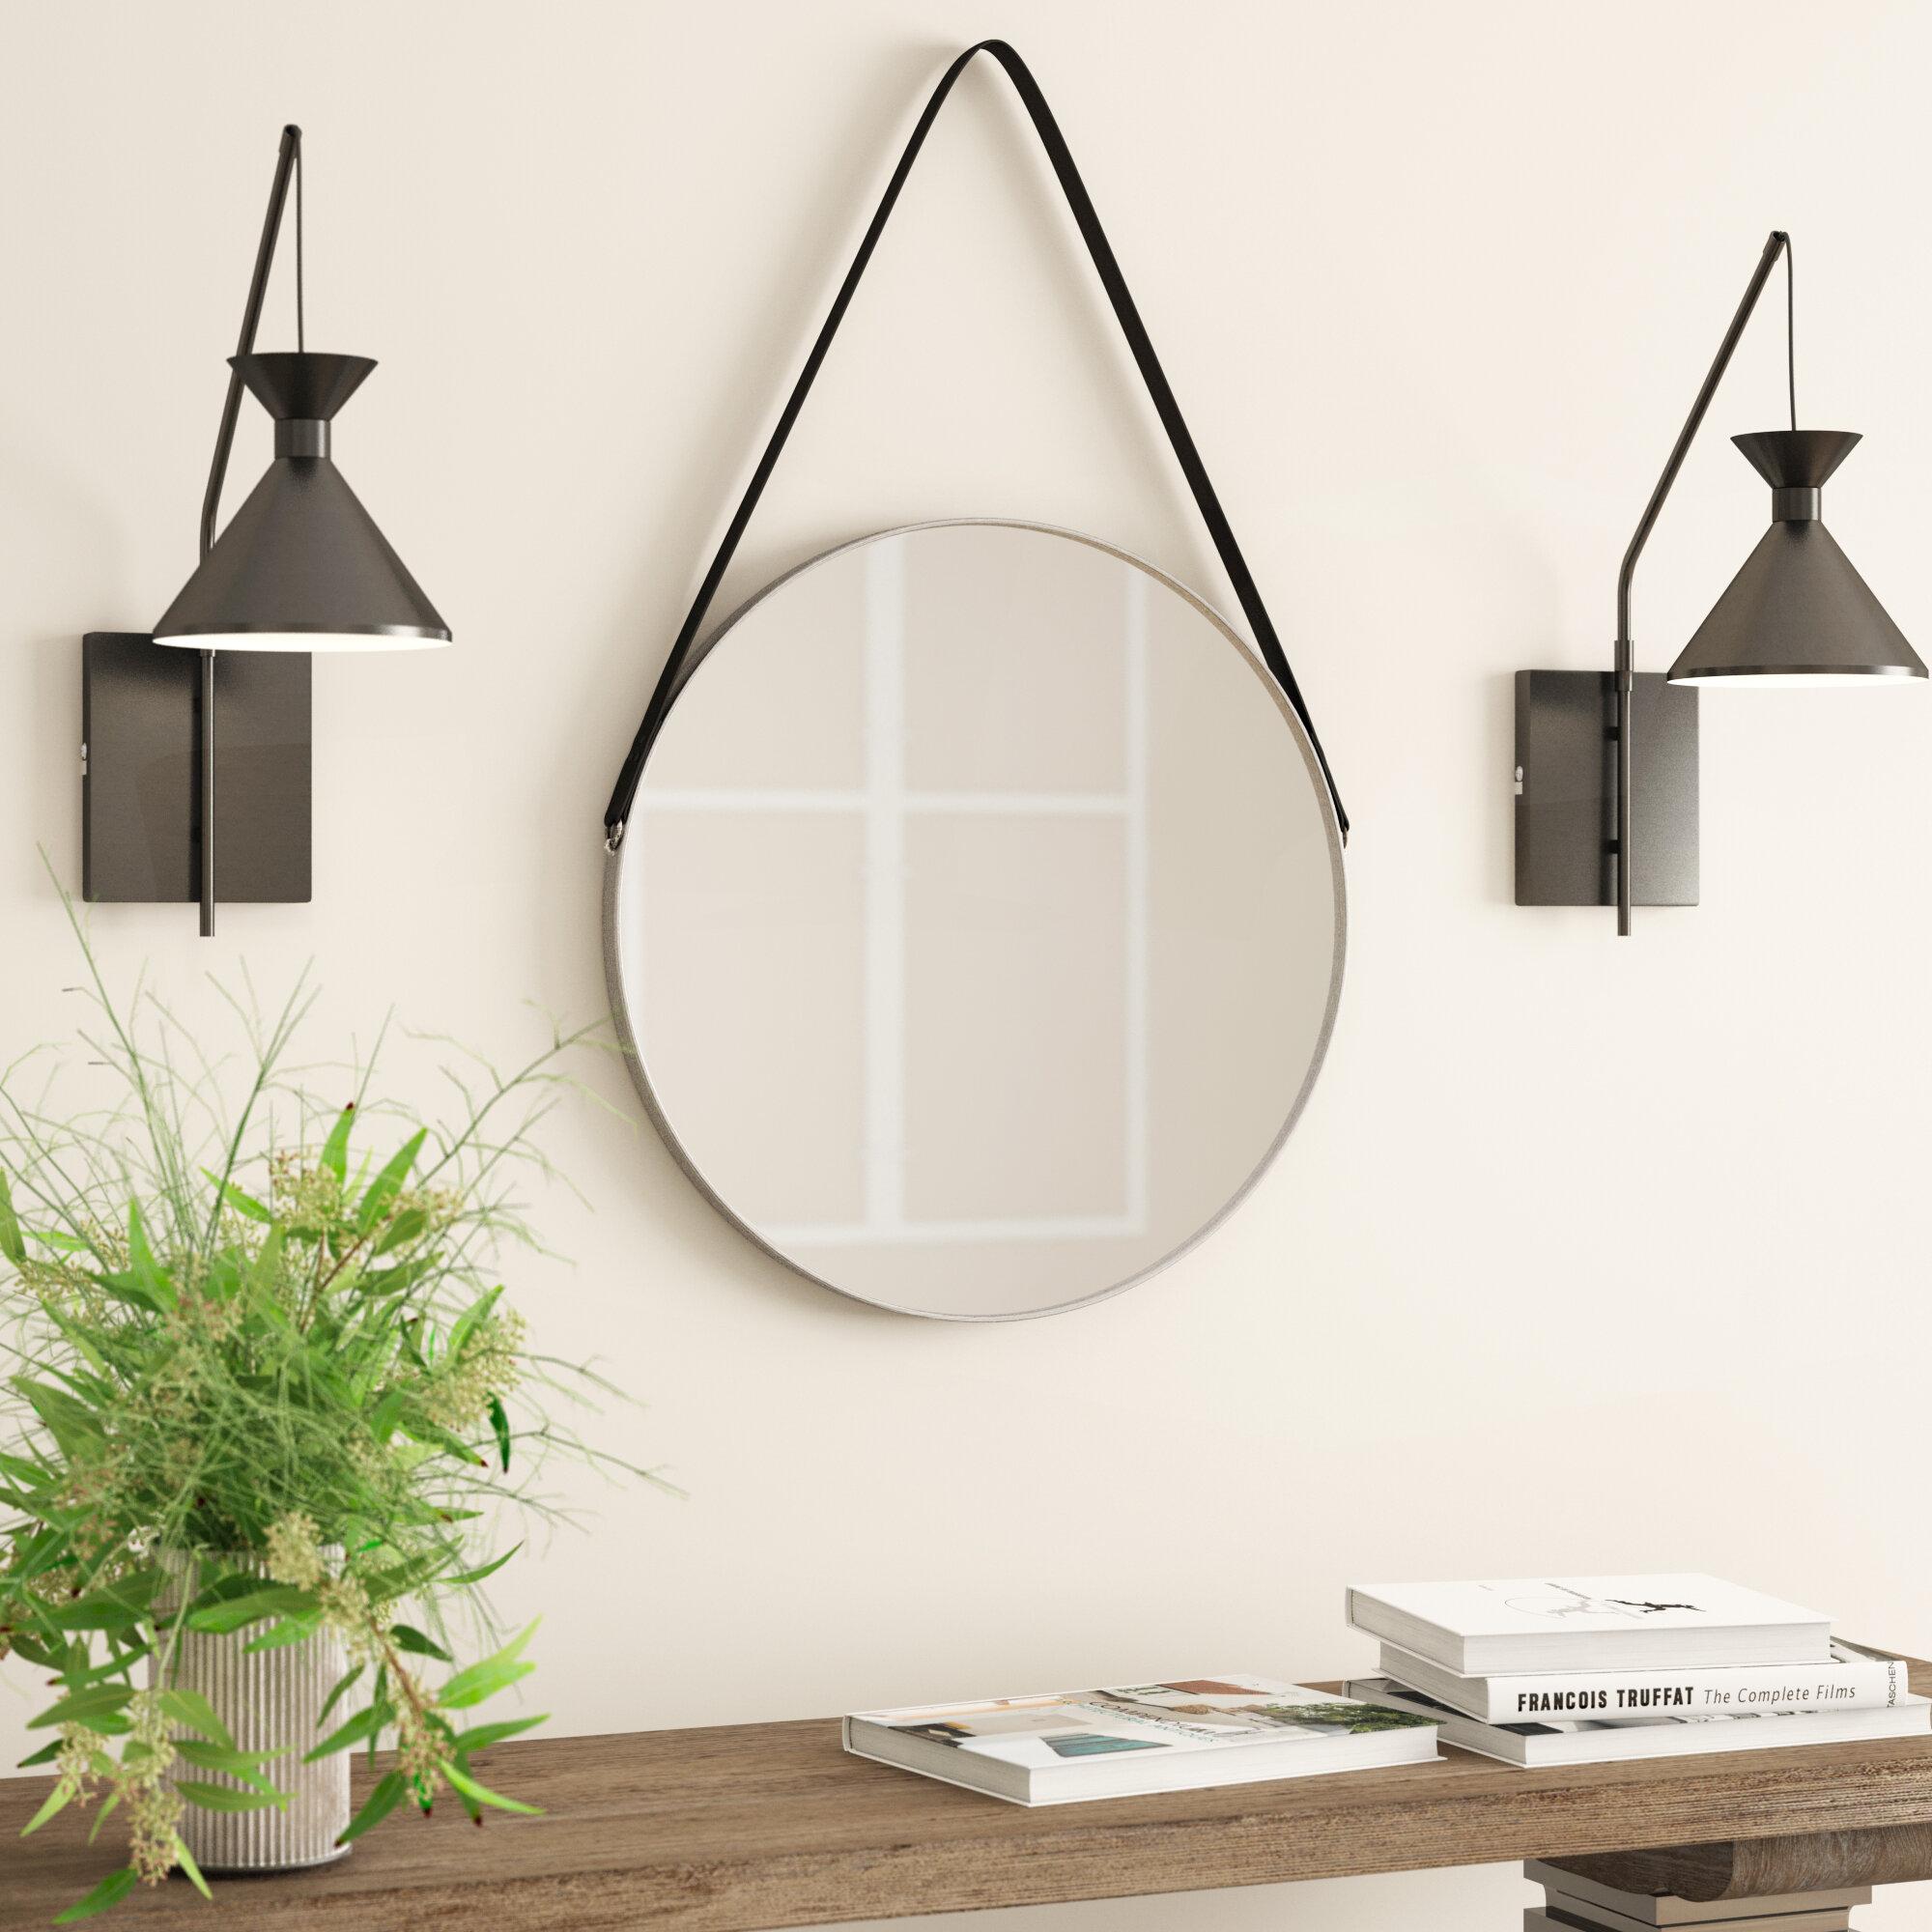 Deko Spiegel Sonnenspiegel Dekorative Acryl Esszimmer Kuche Badezimmer Wandspiegel Fortestelecom Com Br